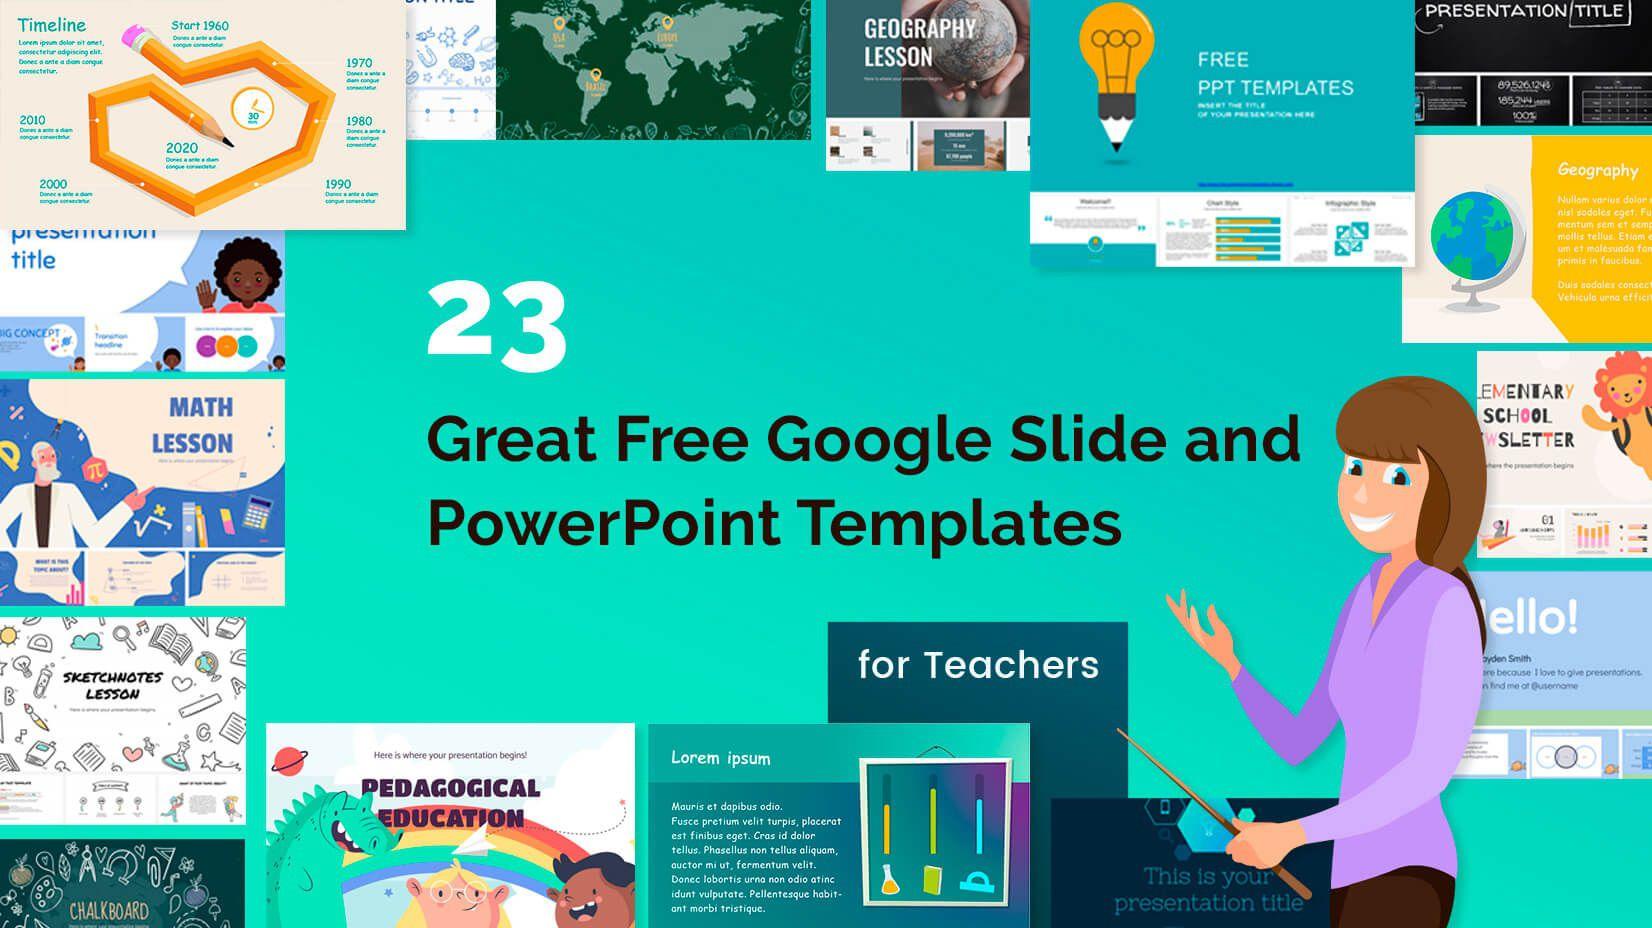 003 Remarkable Ppt Template For Teacher Highest Clarity  Teachers Free Download Powerpoint Education KindergartenFull